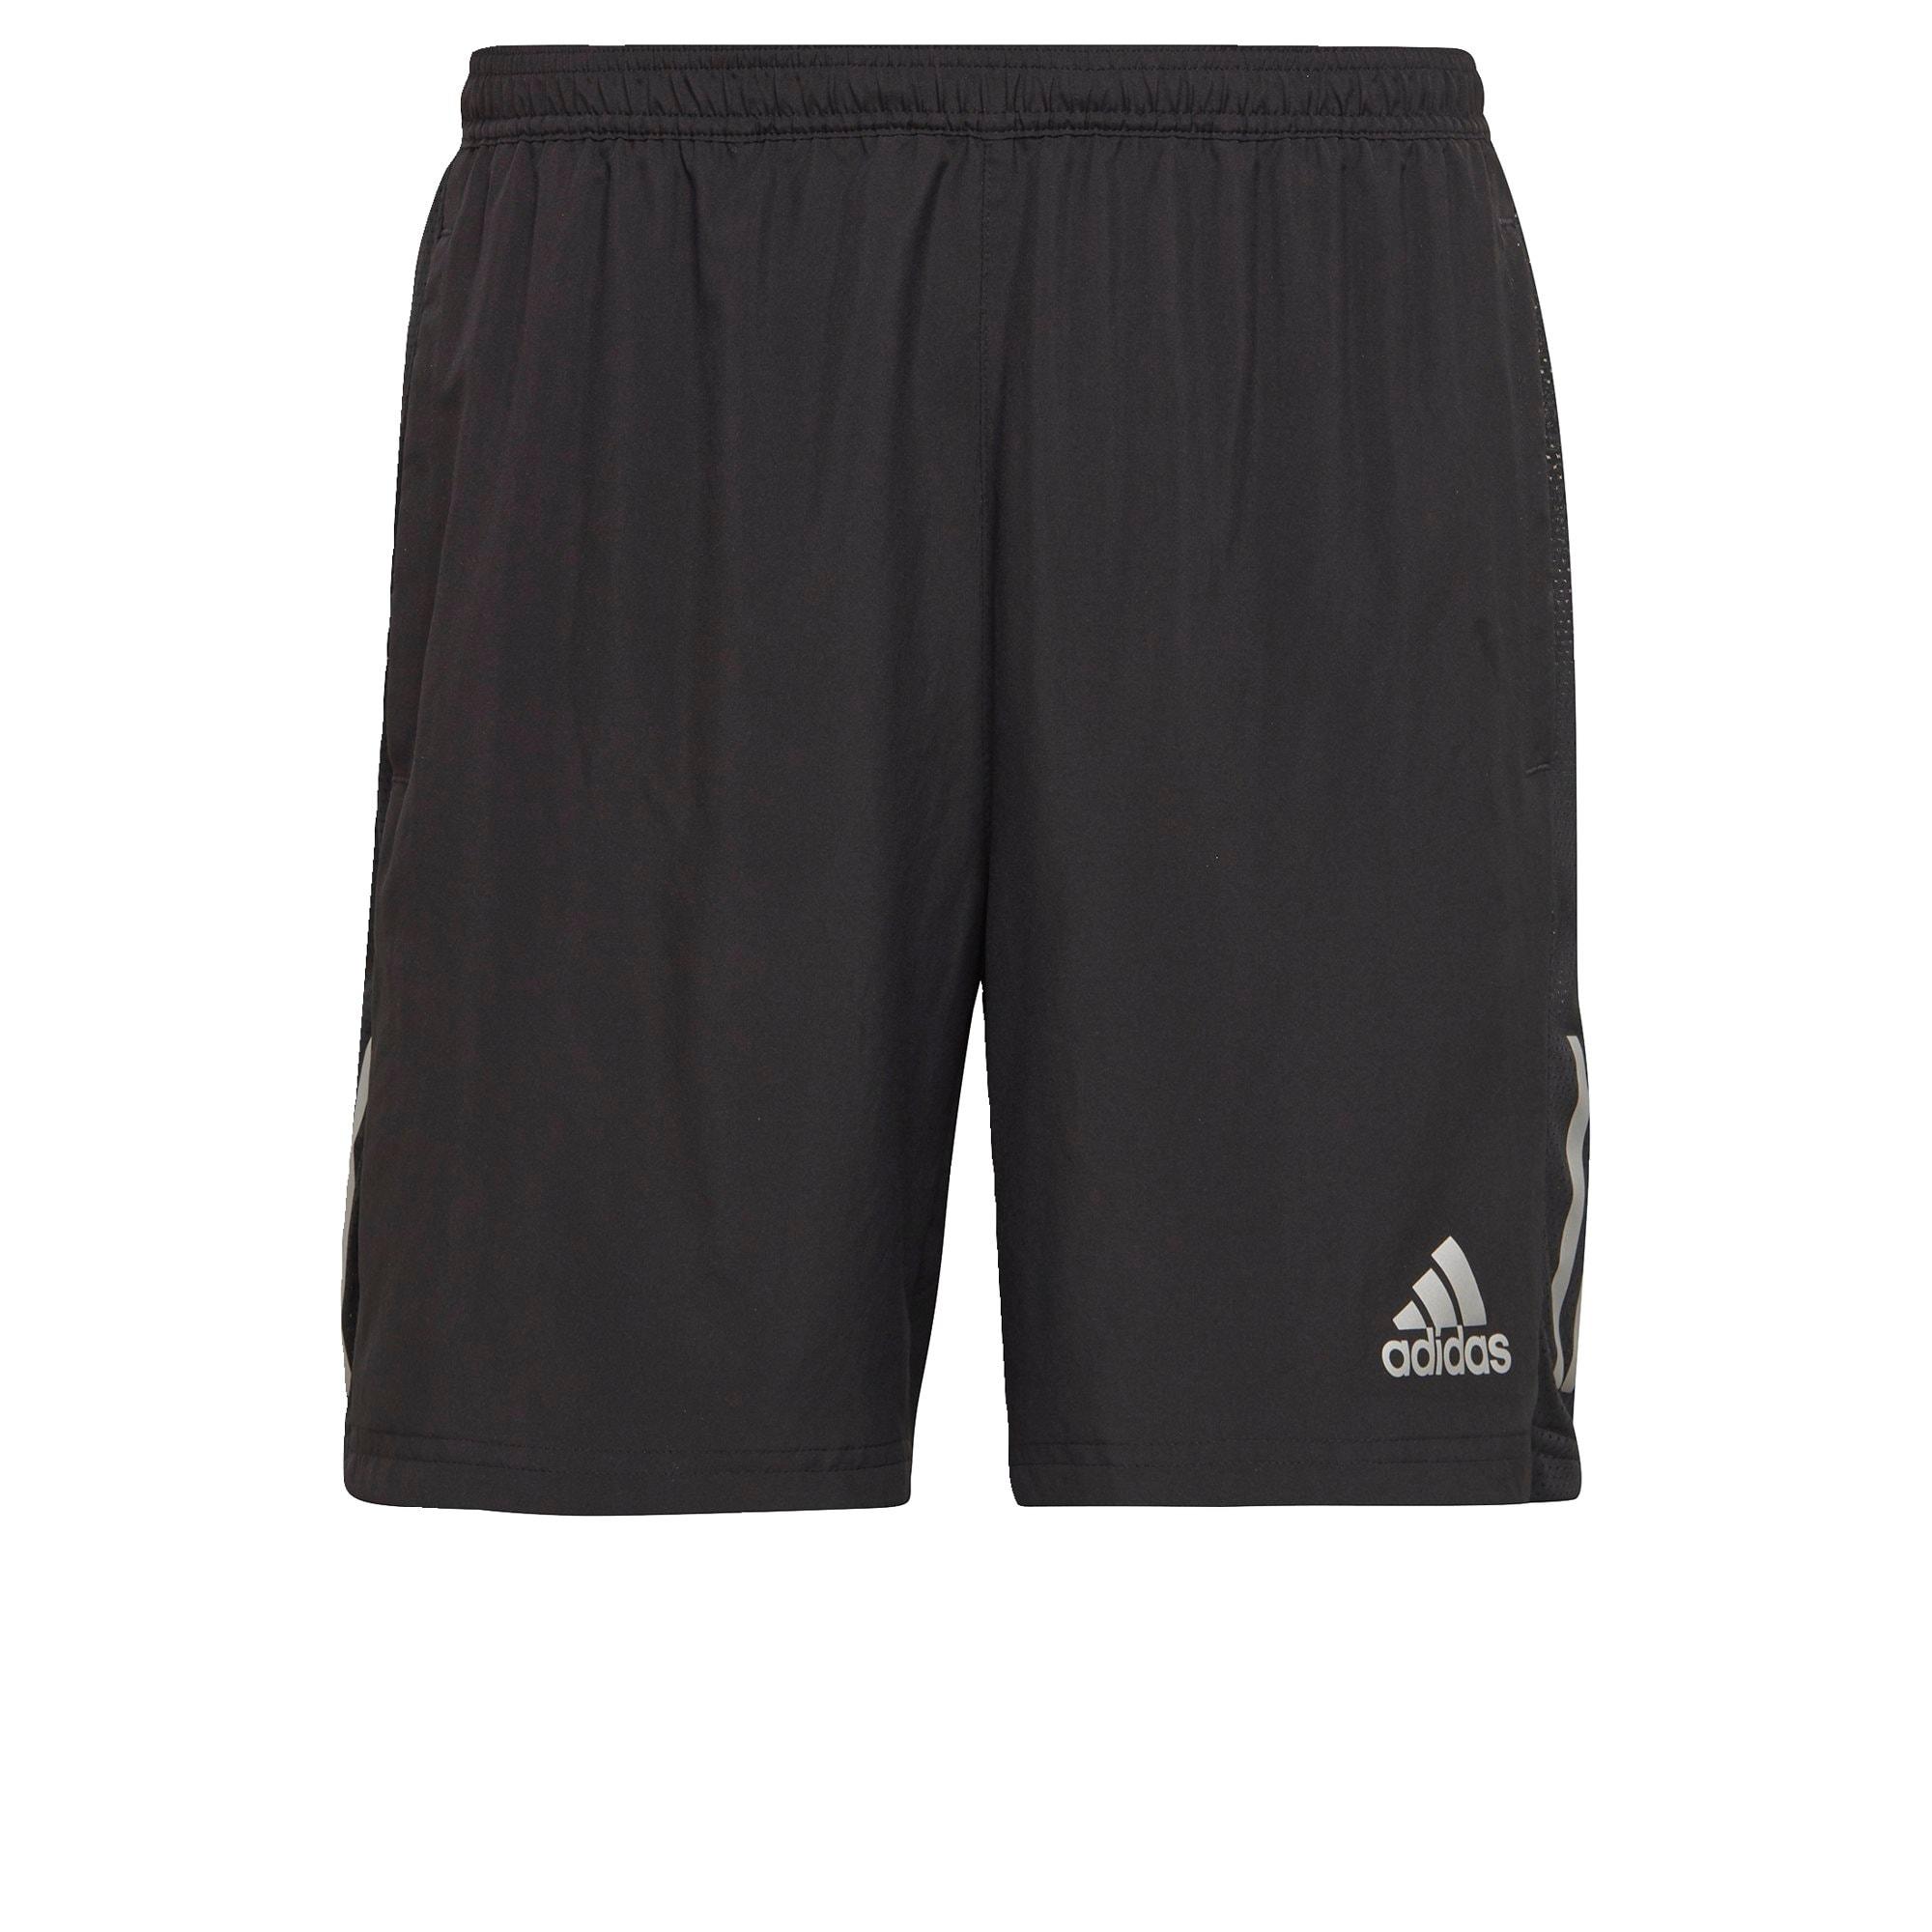 ADIDAS PERFORMANCE Sportovní kalhoty 'Own the Run Two-in-One '  černá / šedá